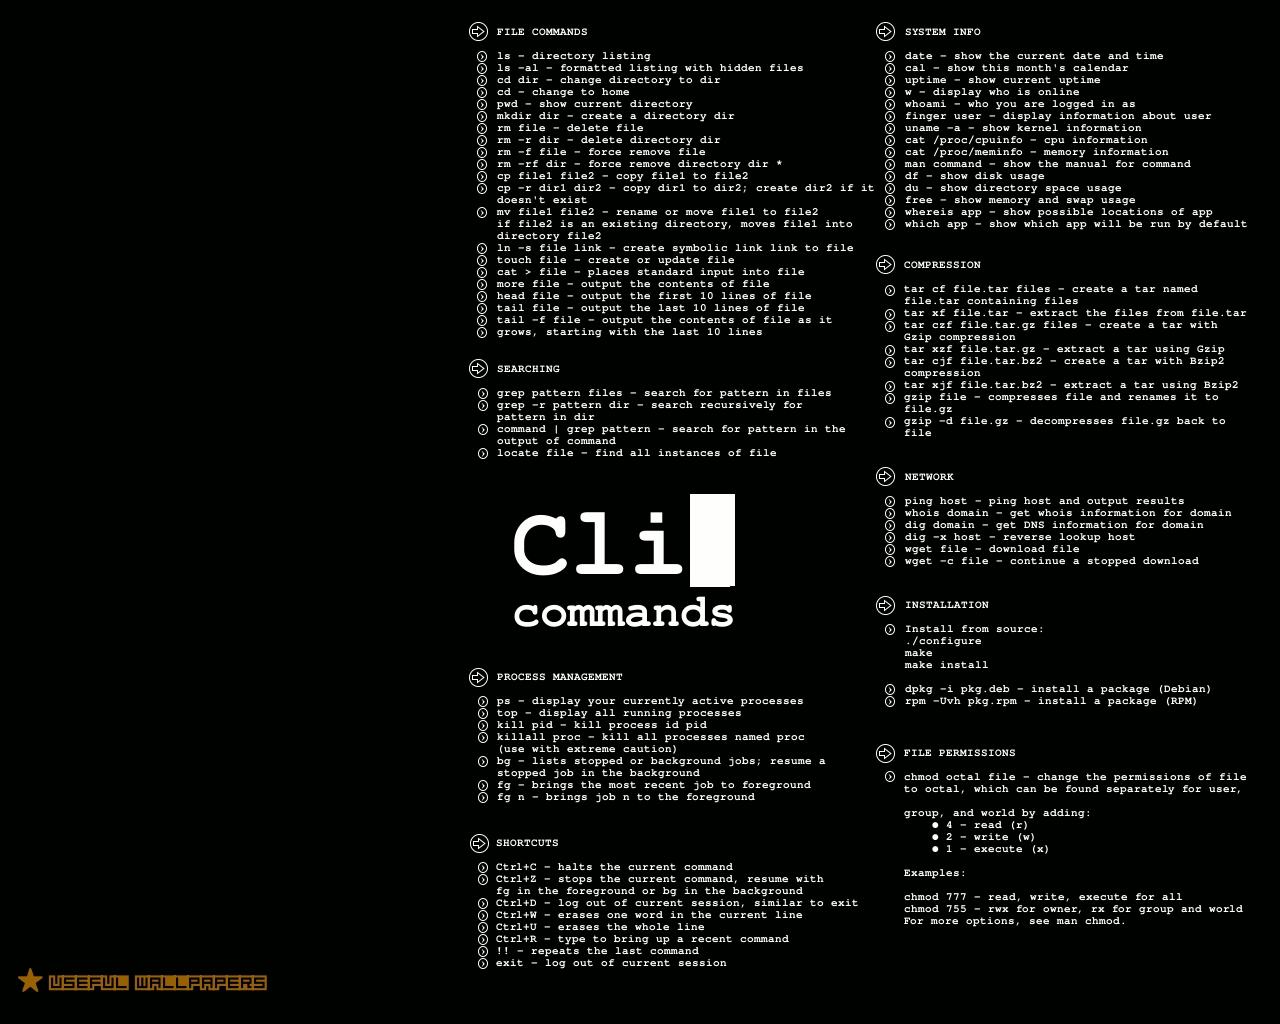 Linux Wallpaper - CLI Cheat Sheet